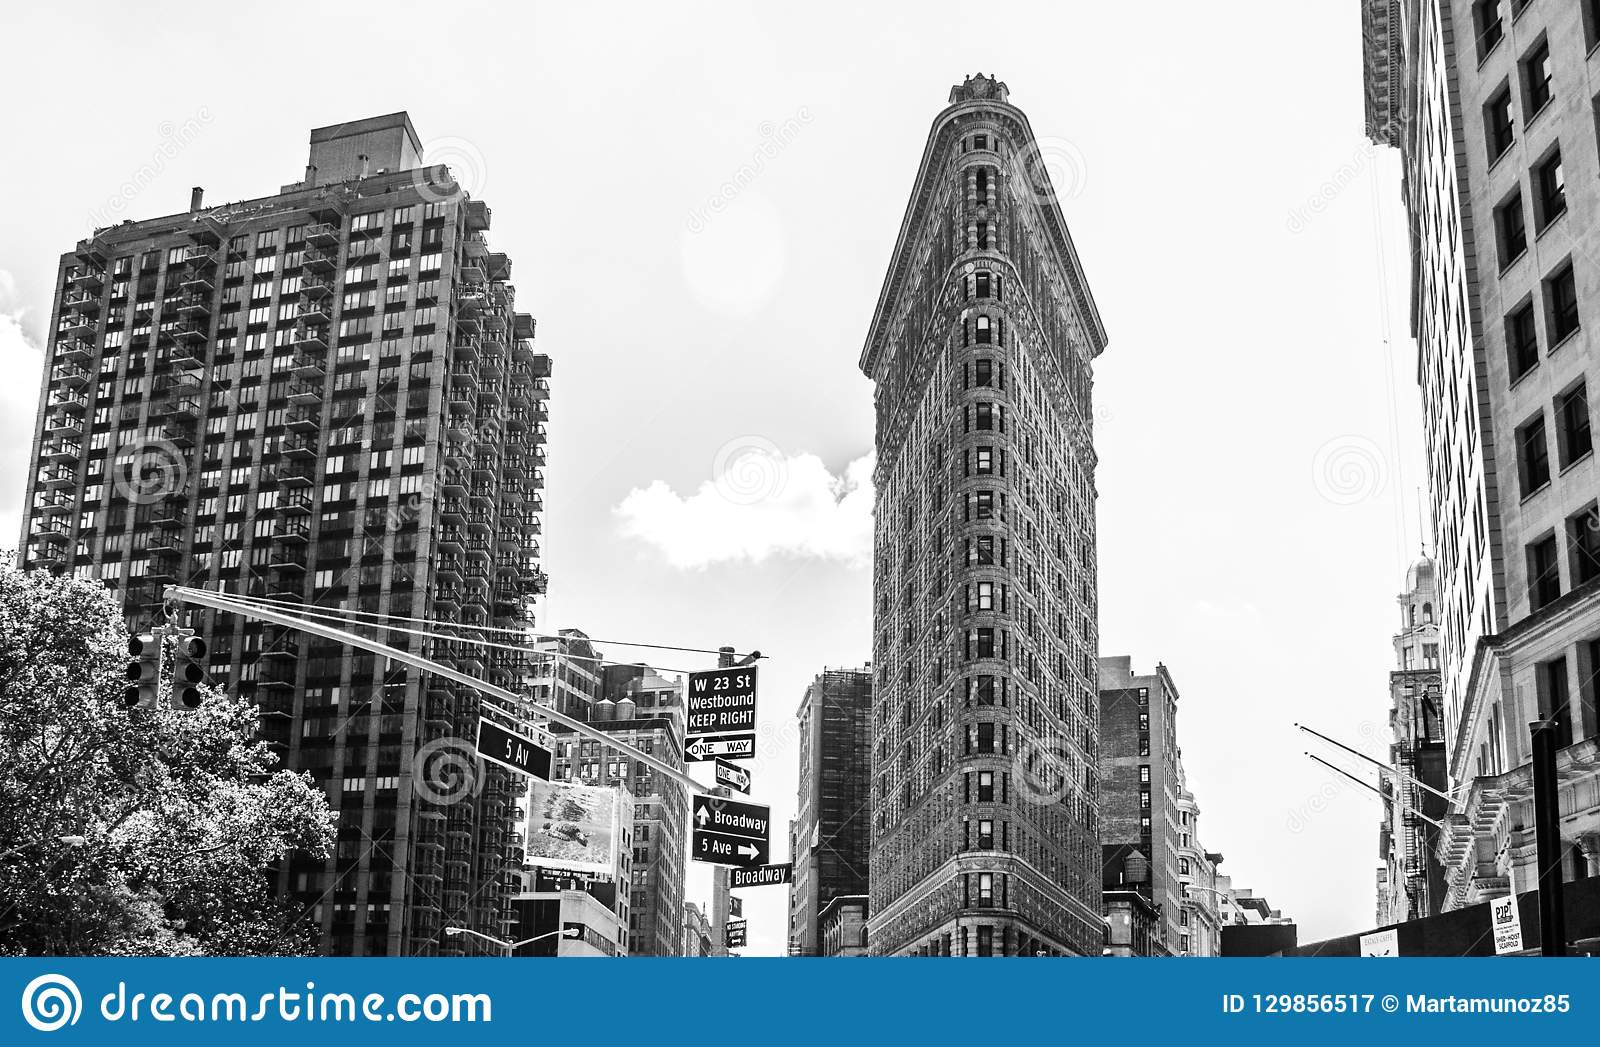 The Flatiron Building, New York City.